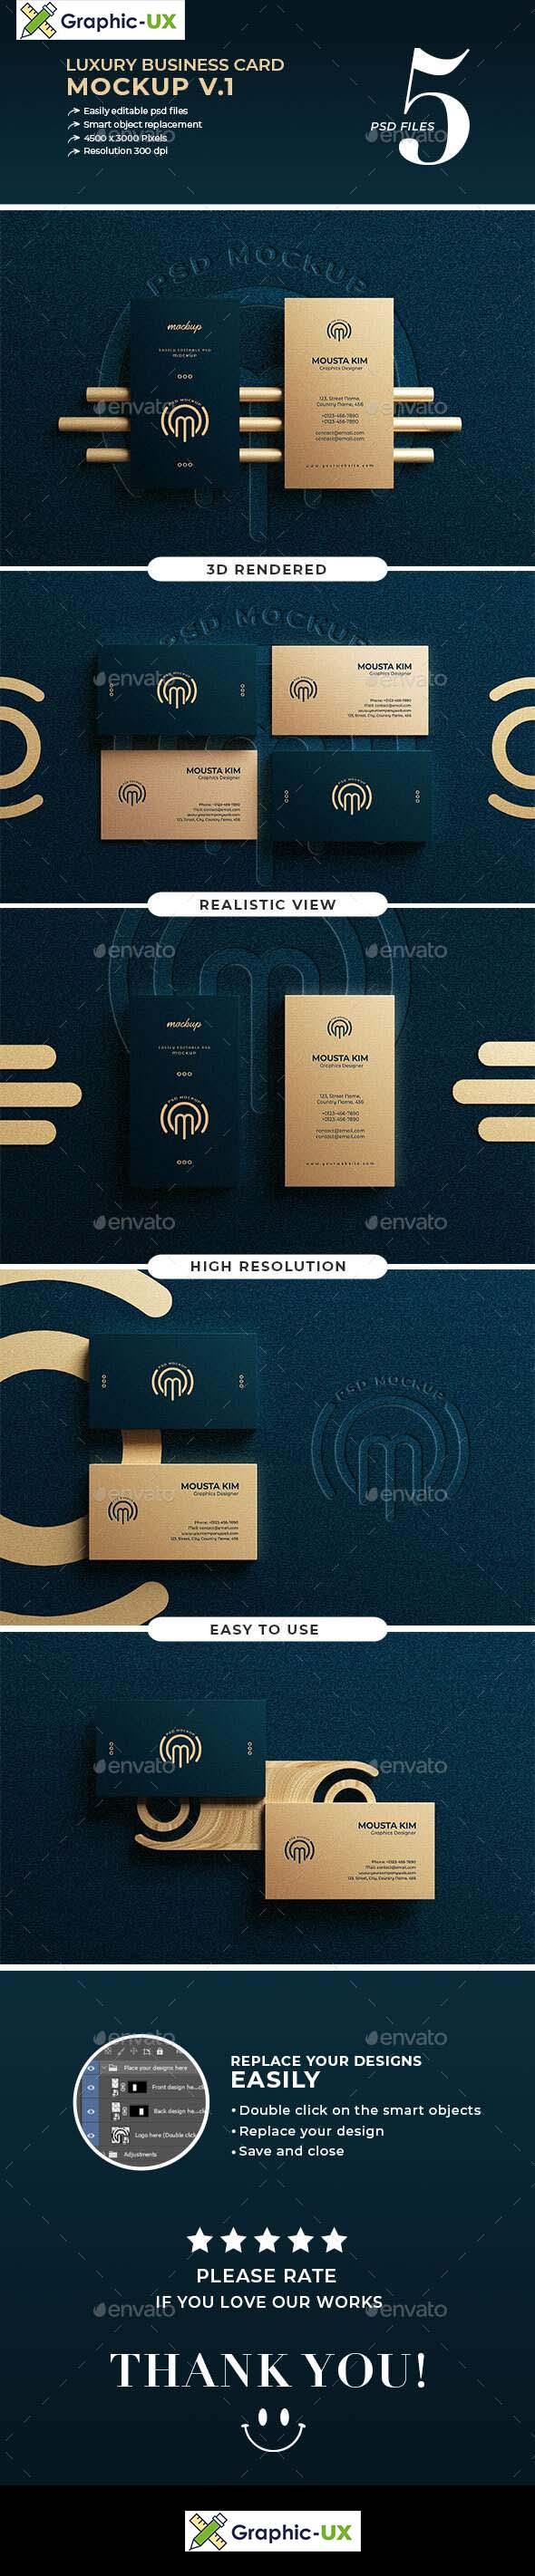 Luxury business card mockup v.1